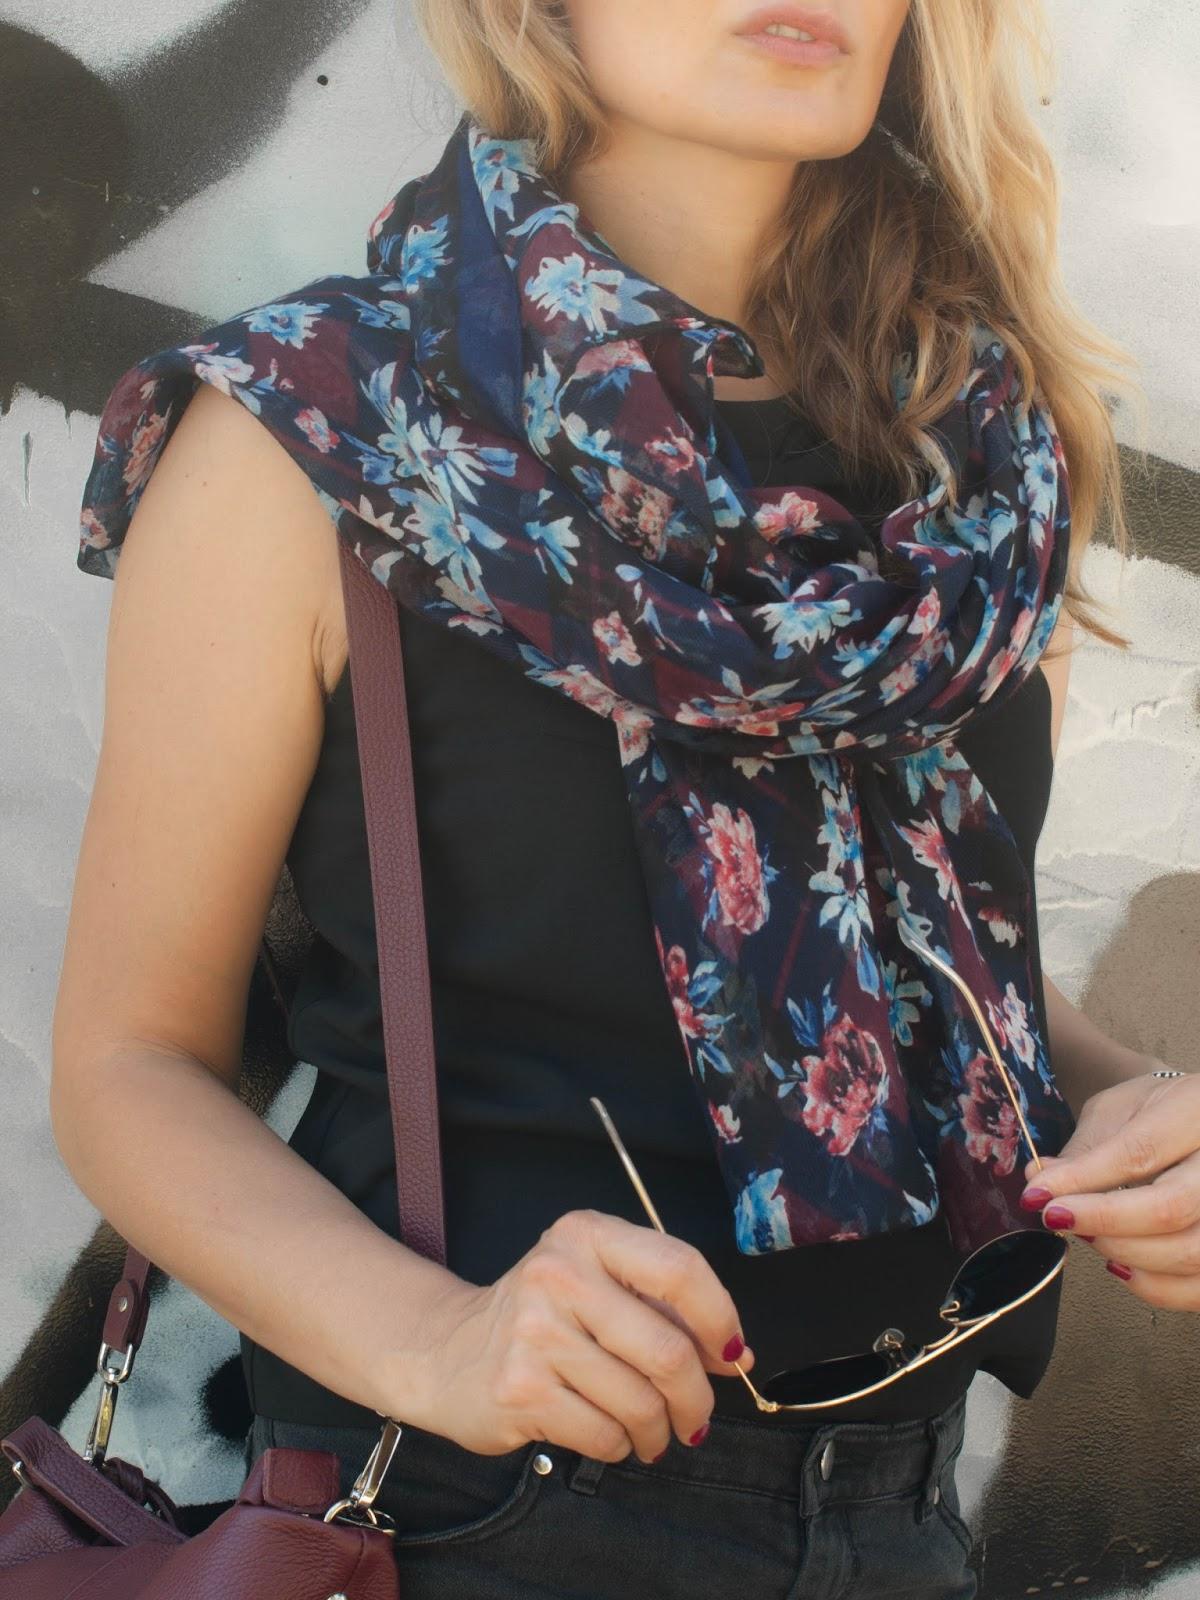 Zara floral scarf, Zara scarf, Zara fall 13, HM fall collection 13, Dark florals, moody florals, floral scarf, Zoya nail polish in Vanessa